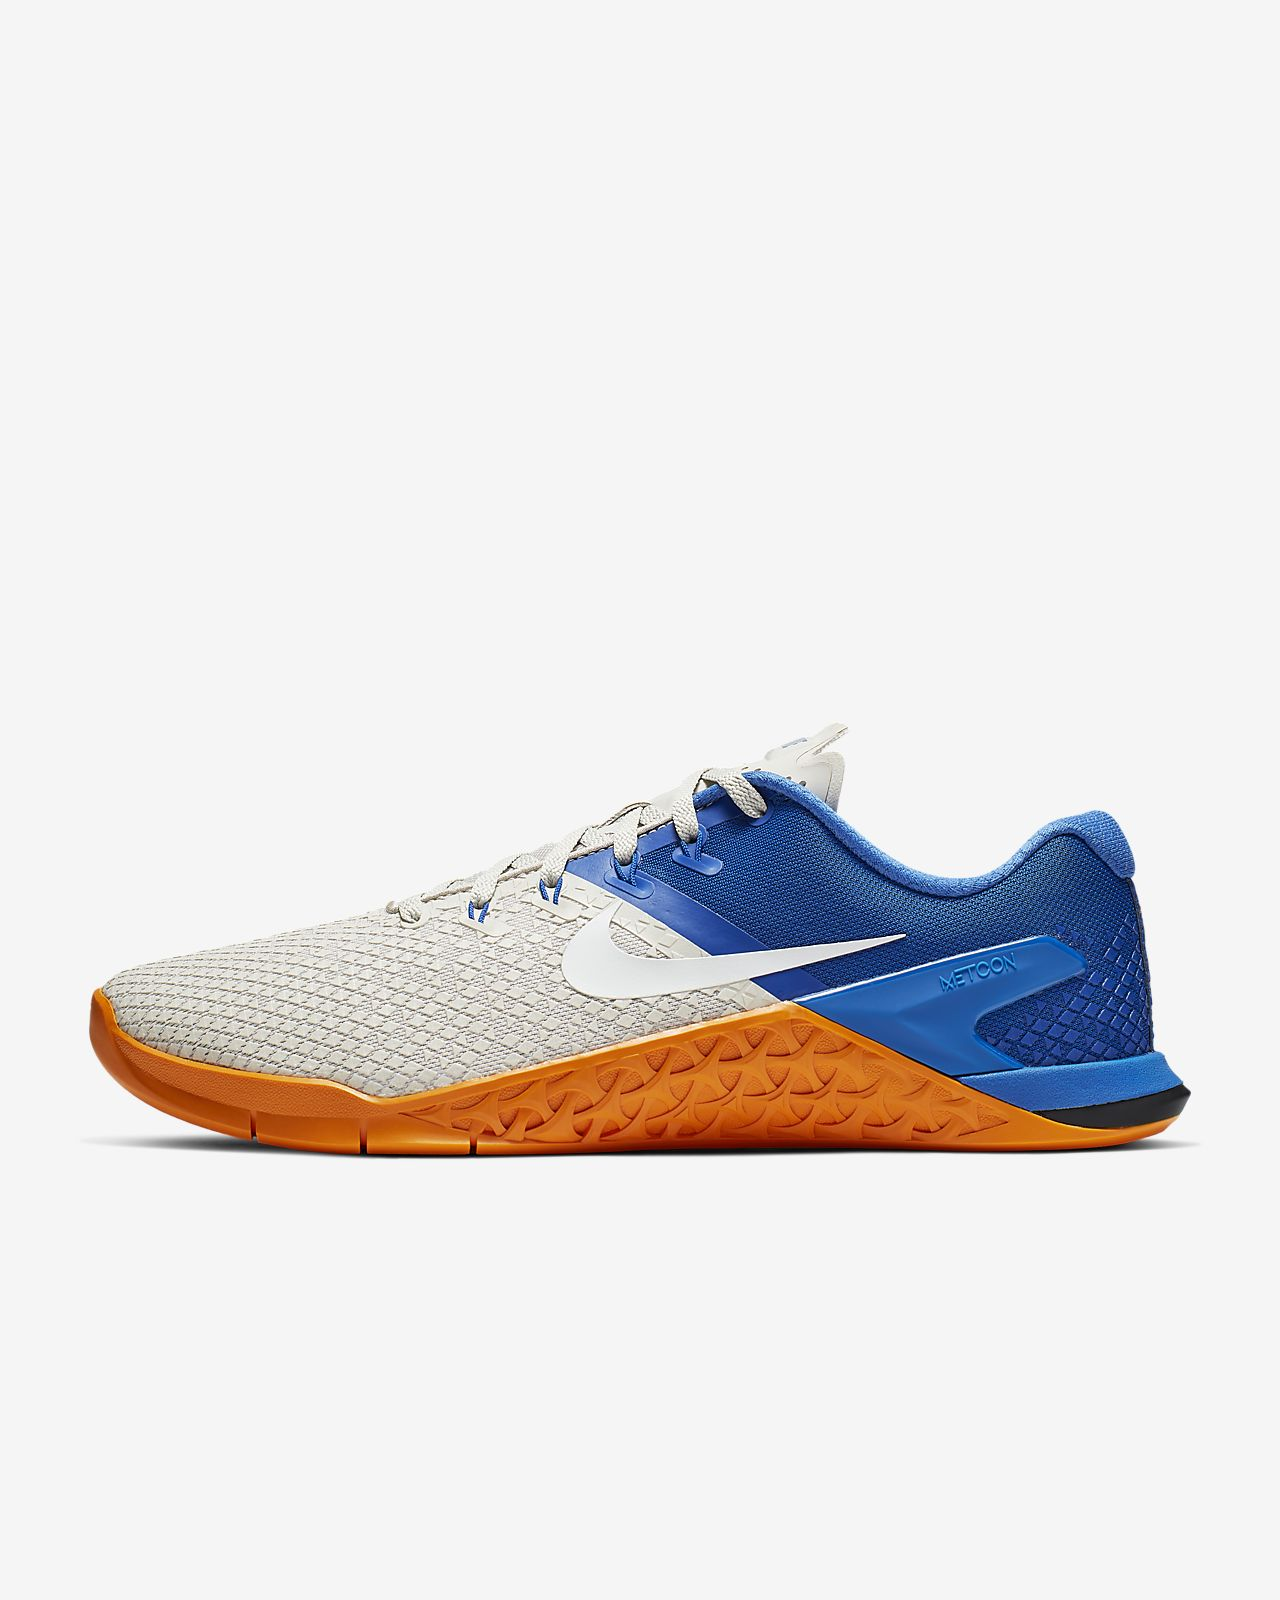 Scarpa da training Nike Metcon 4 XD - Uomo